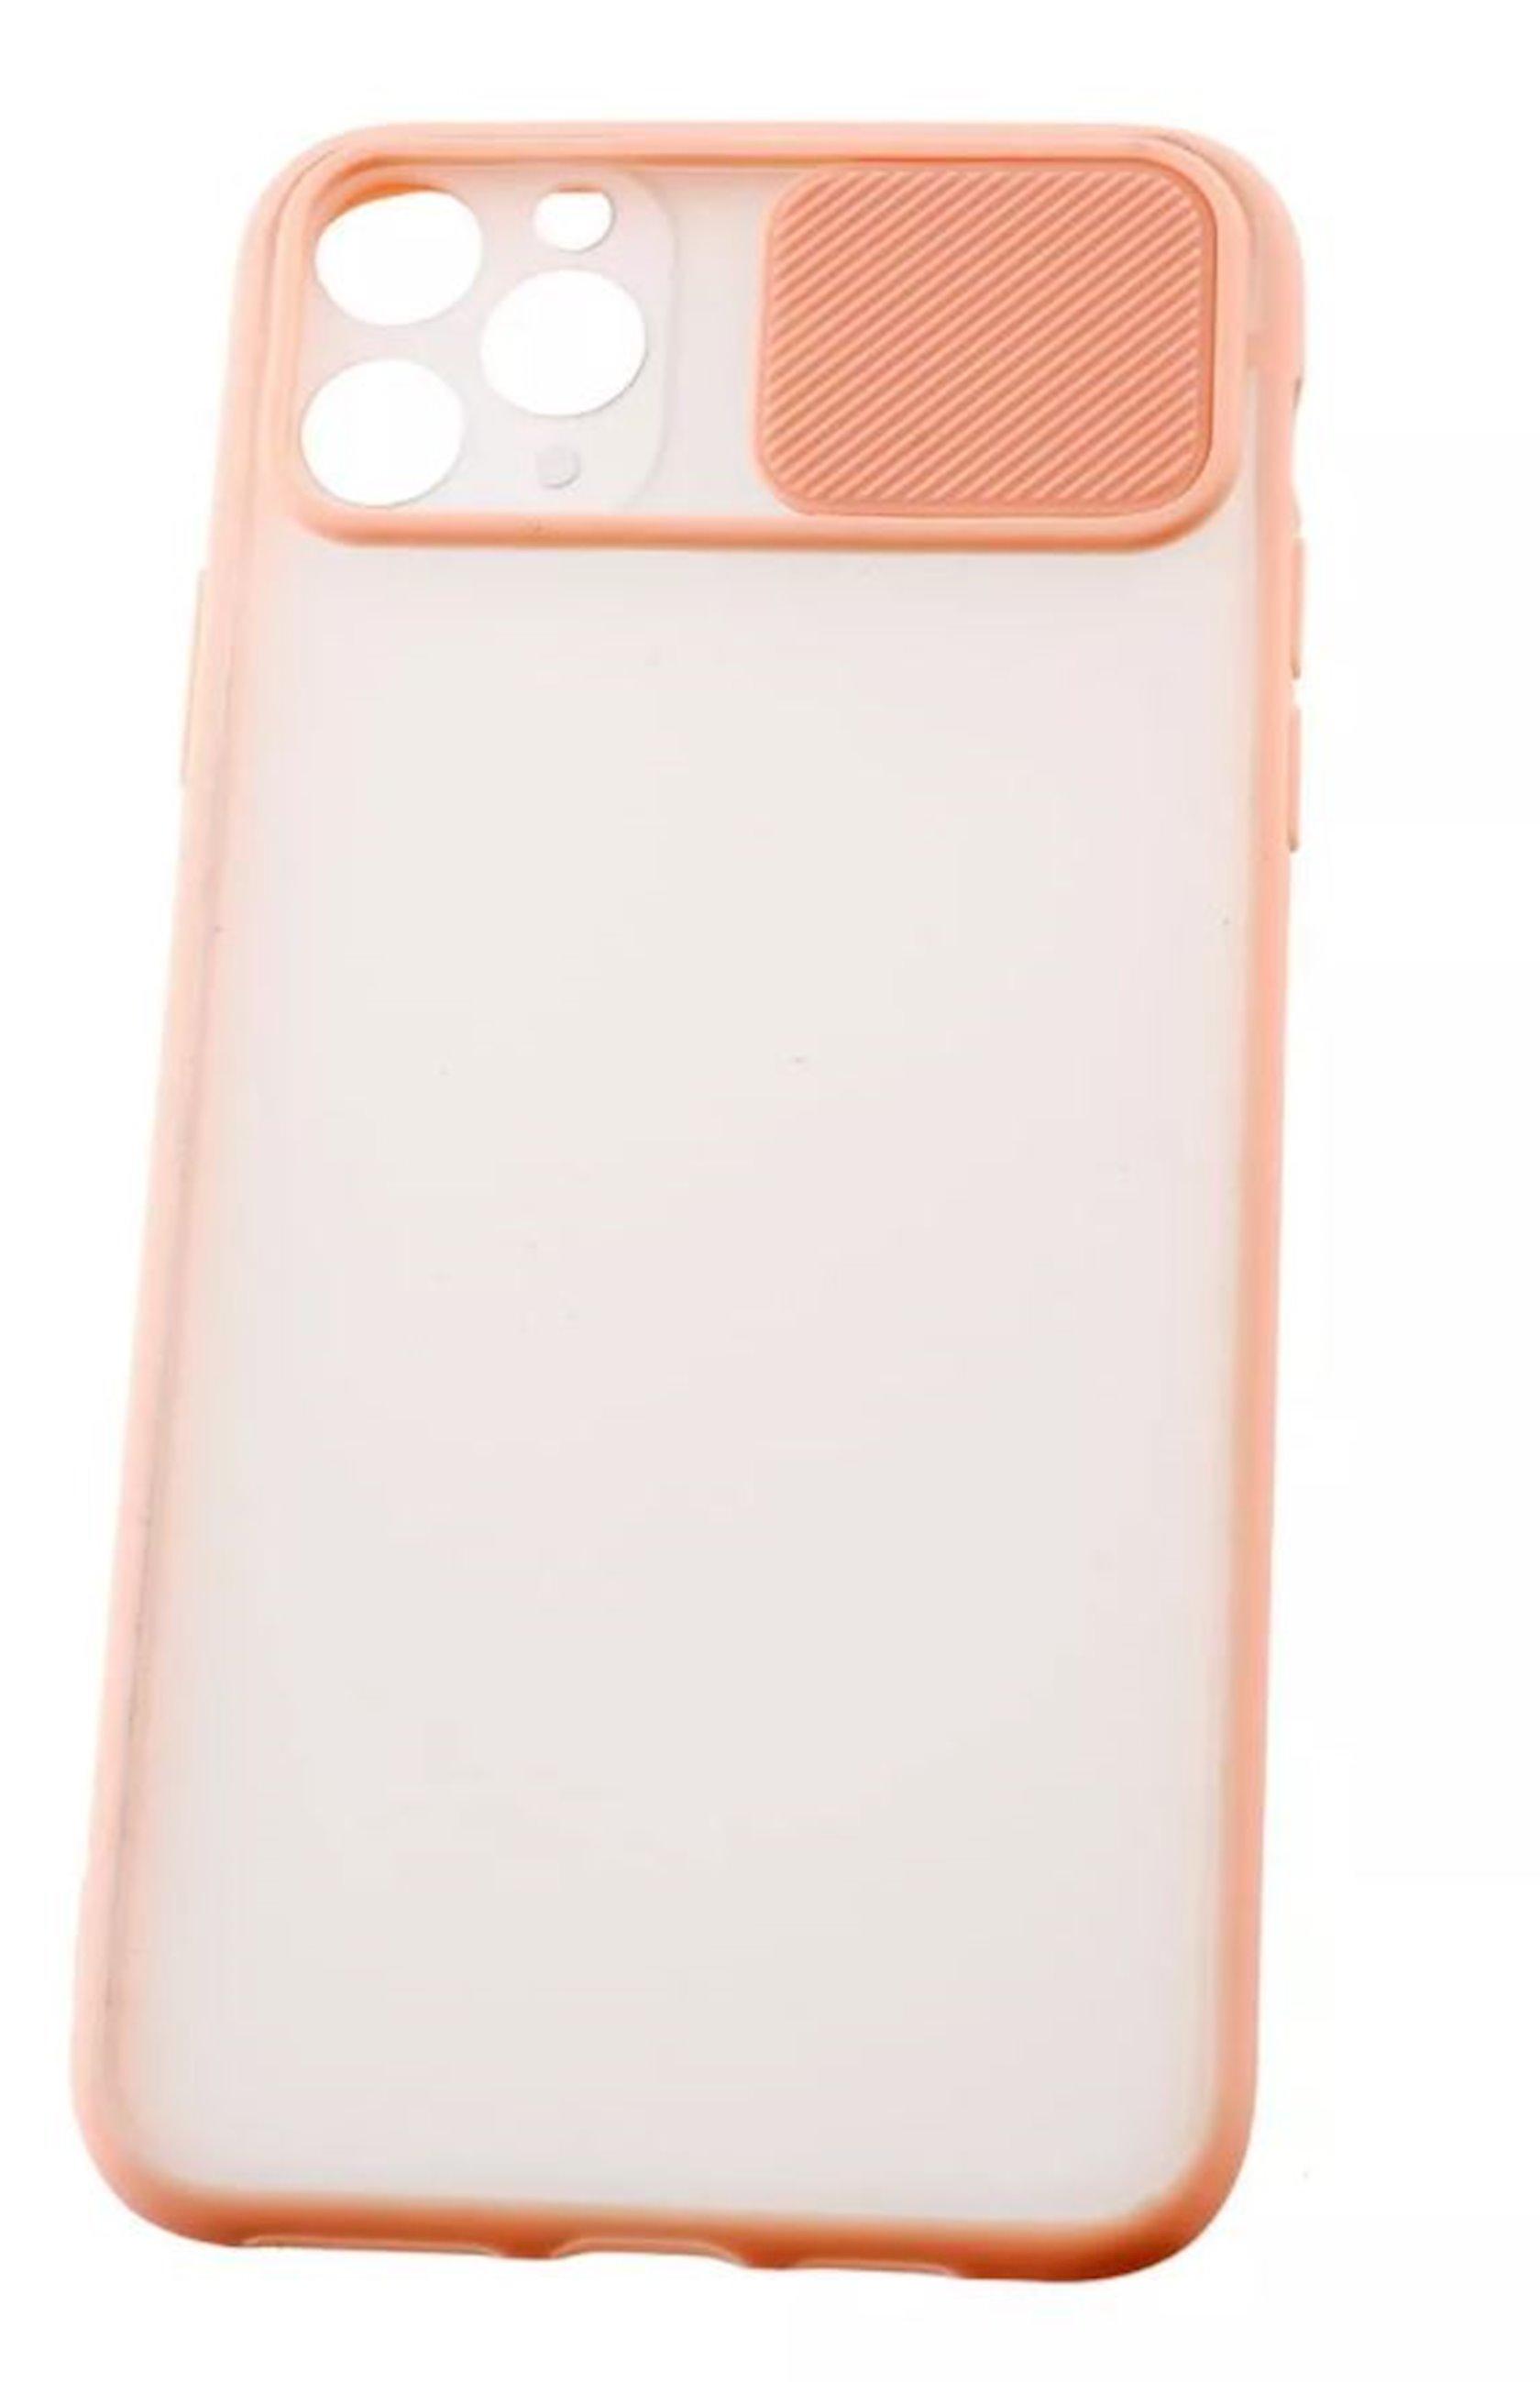 Çexol YO Camshield Color Apple iPhone 11 Pro üçün  Pink